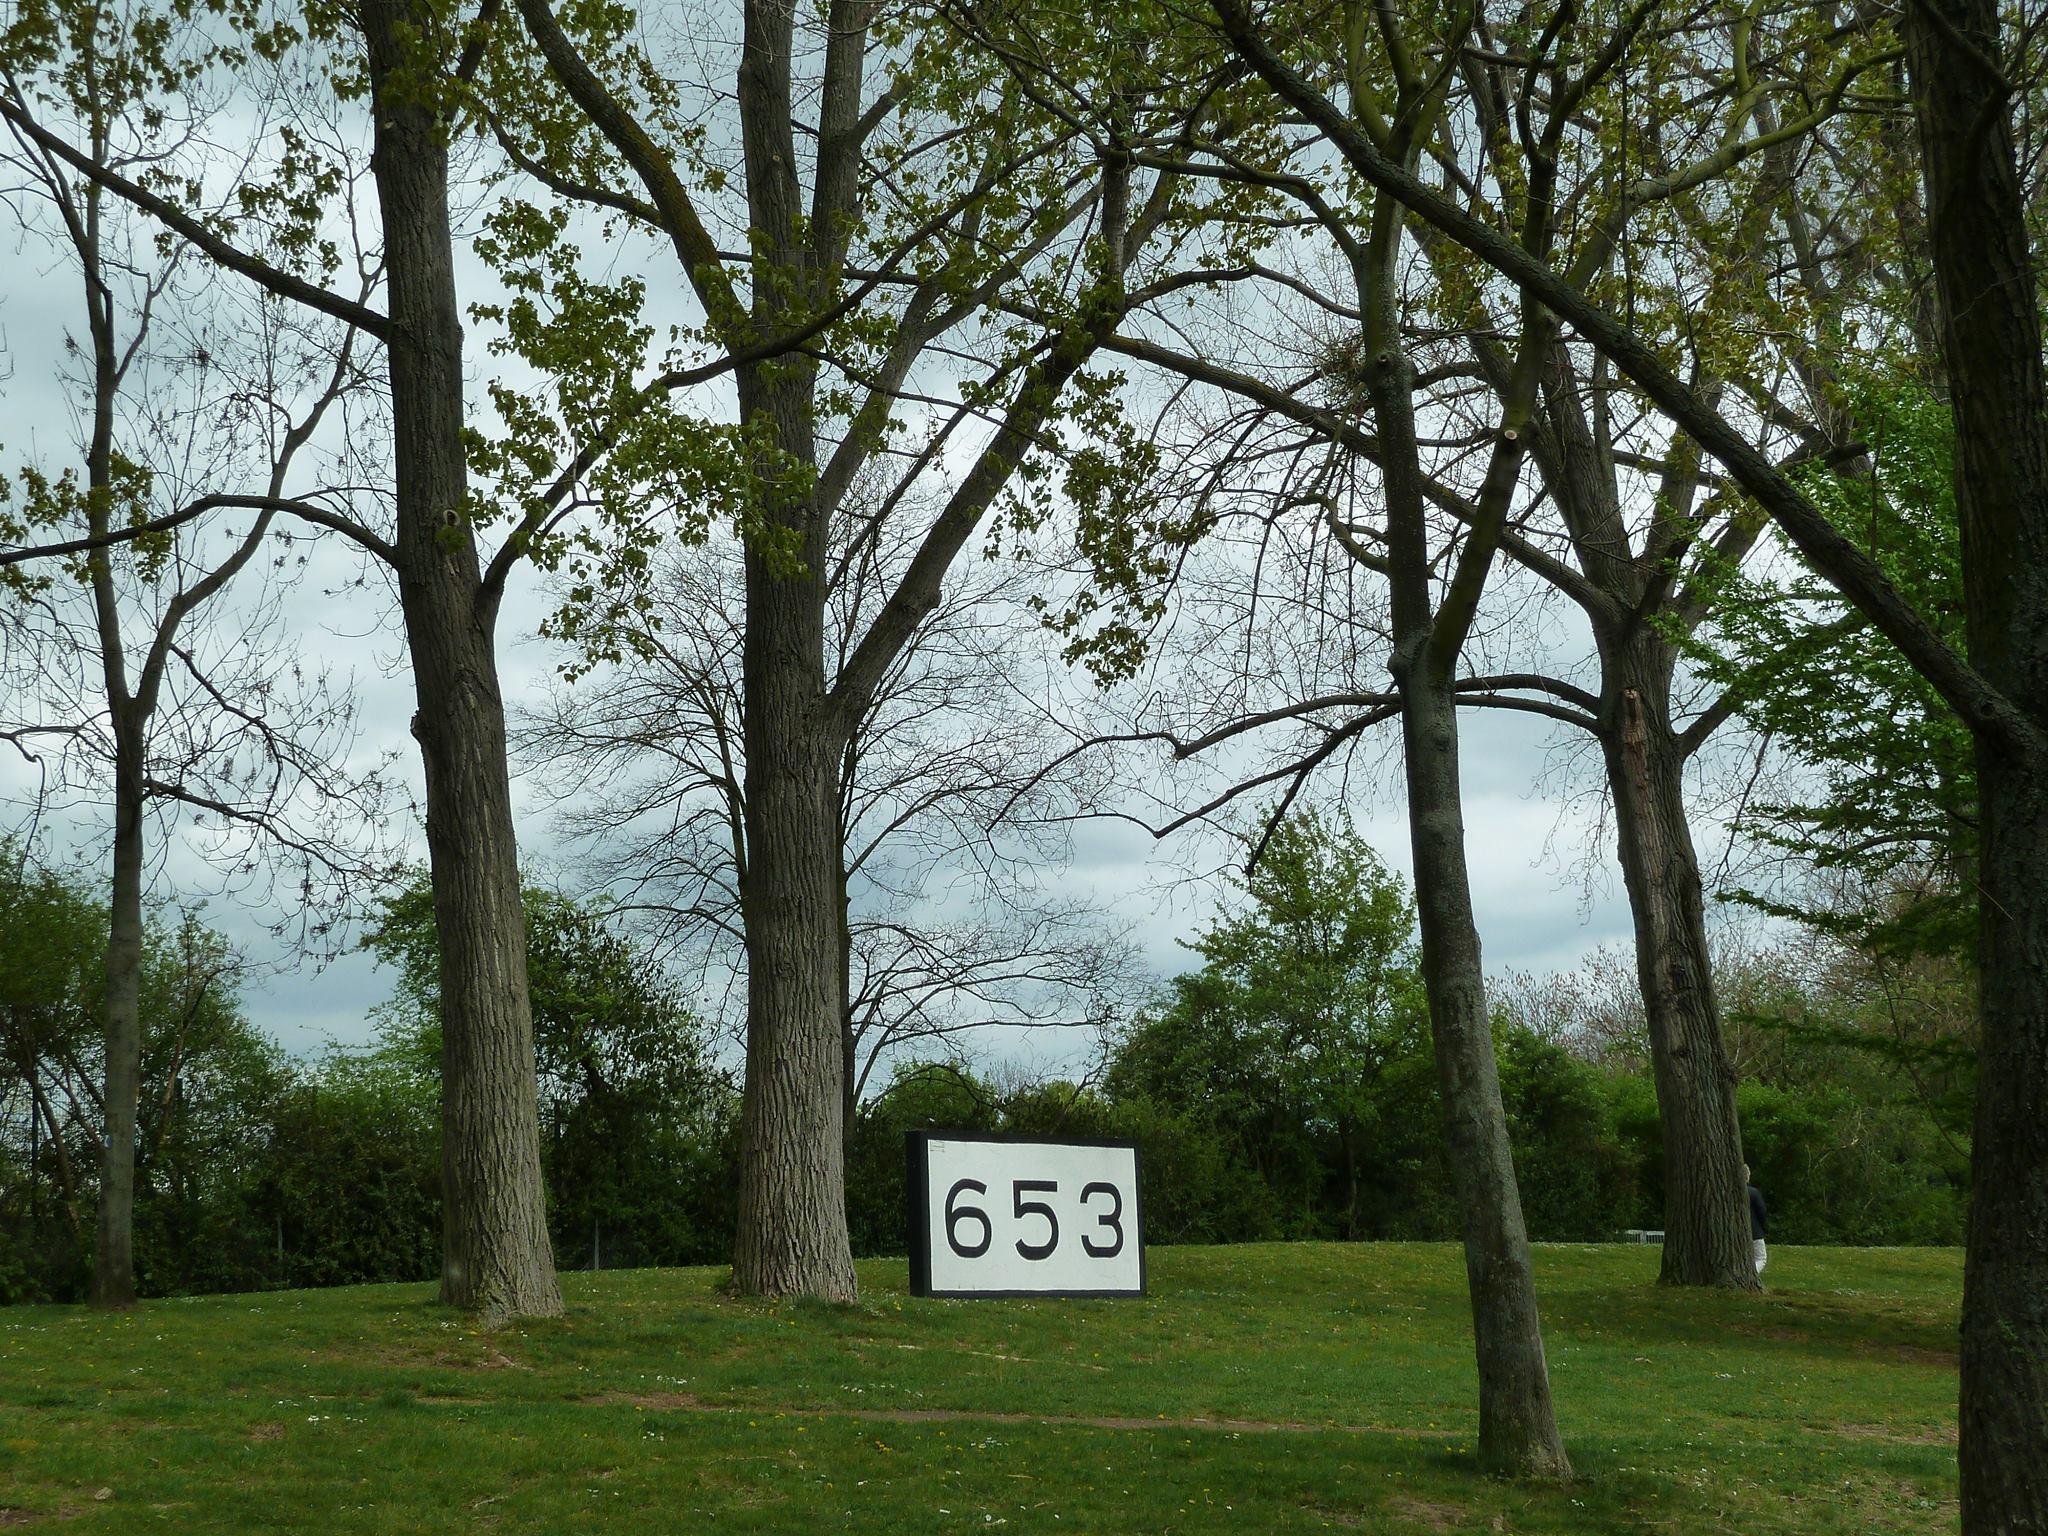 rheinkilometer-653-4